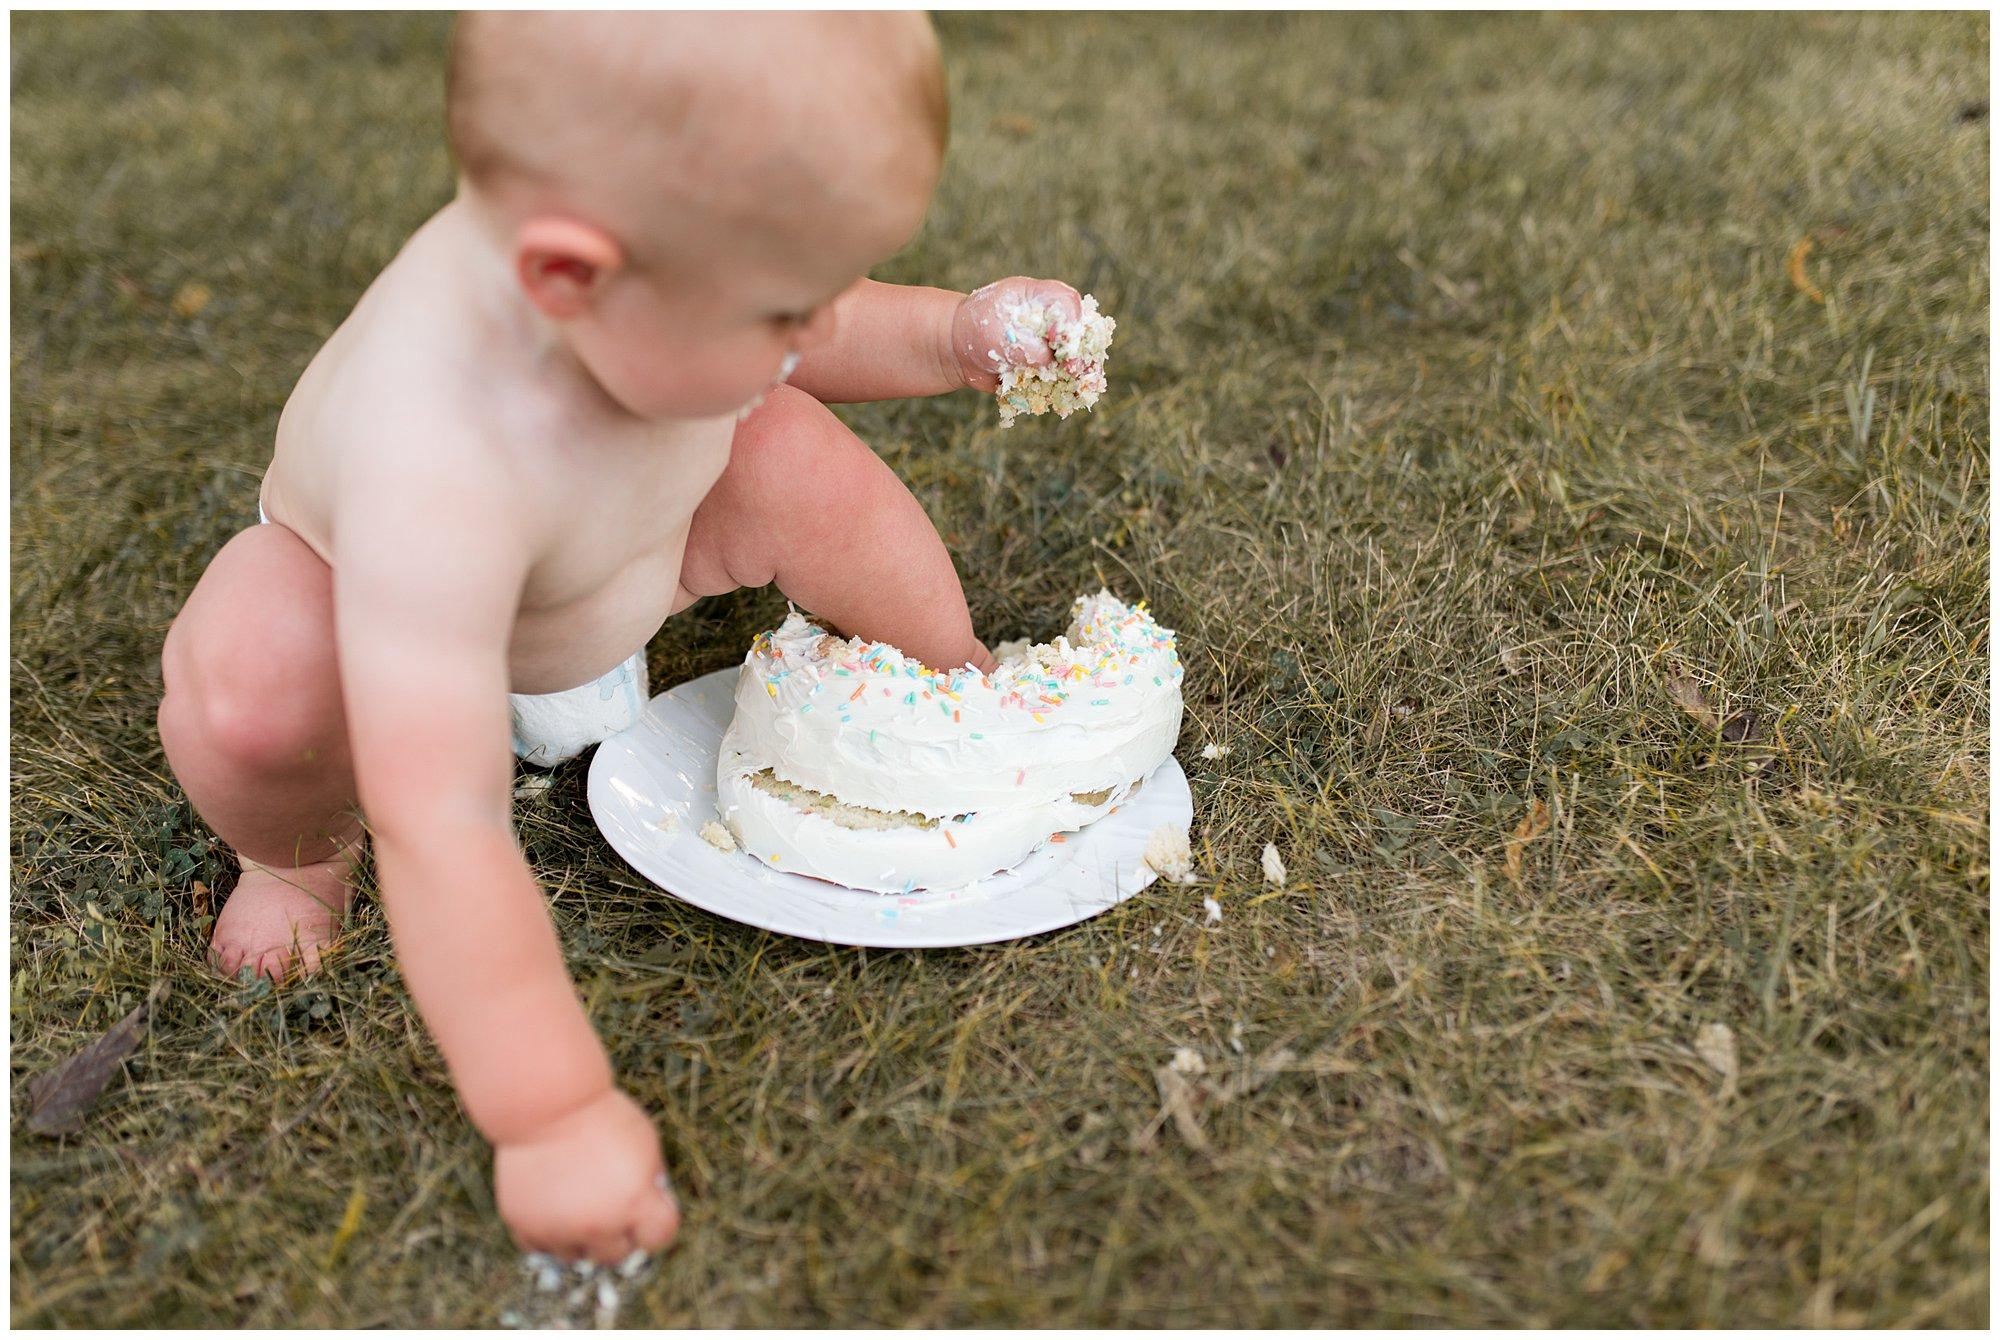 baby first birthday cake smash in Muncie Indiana